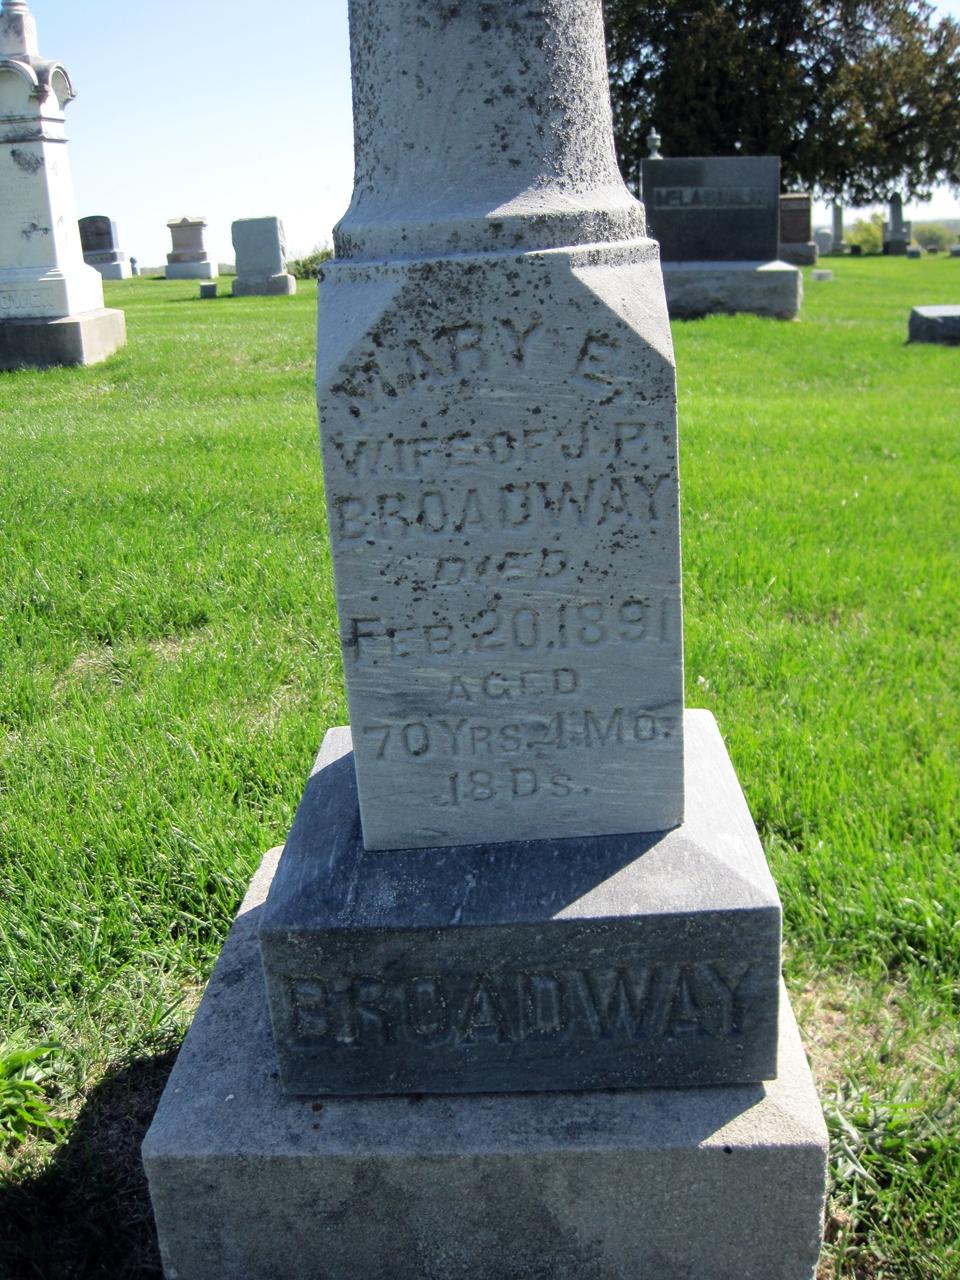 Mary E Broadway